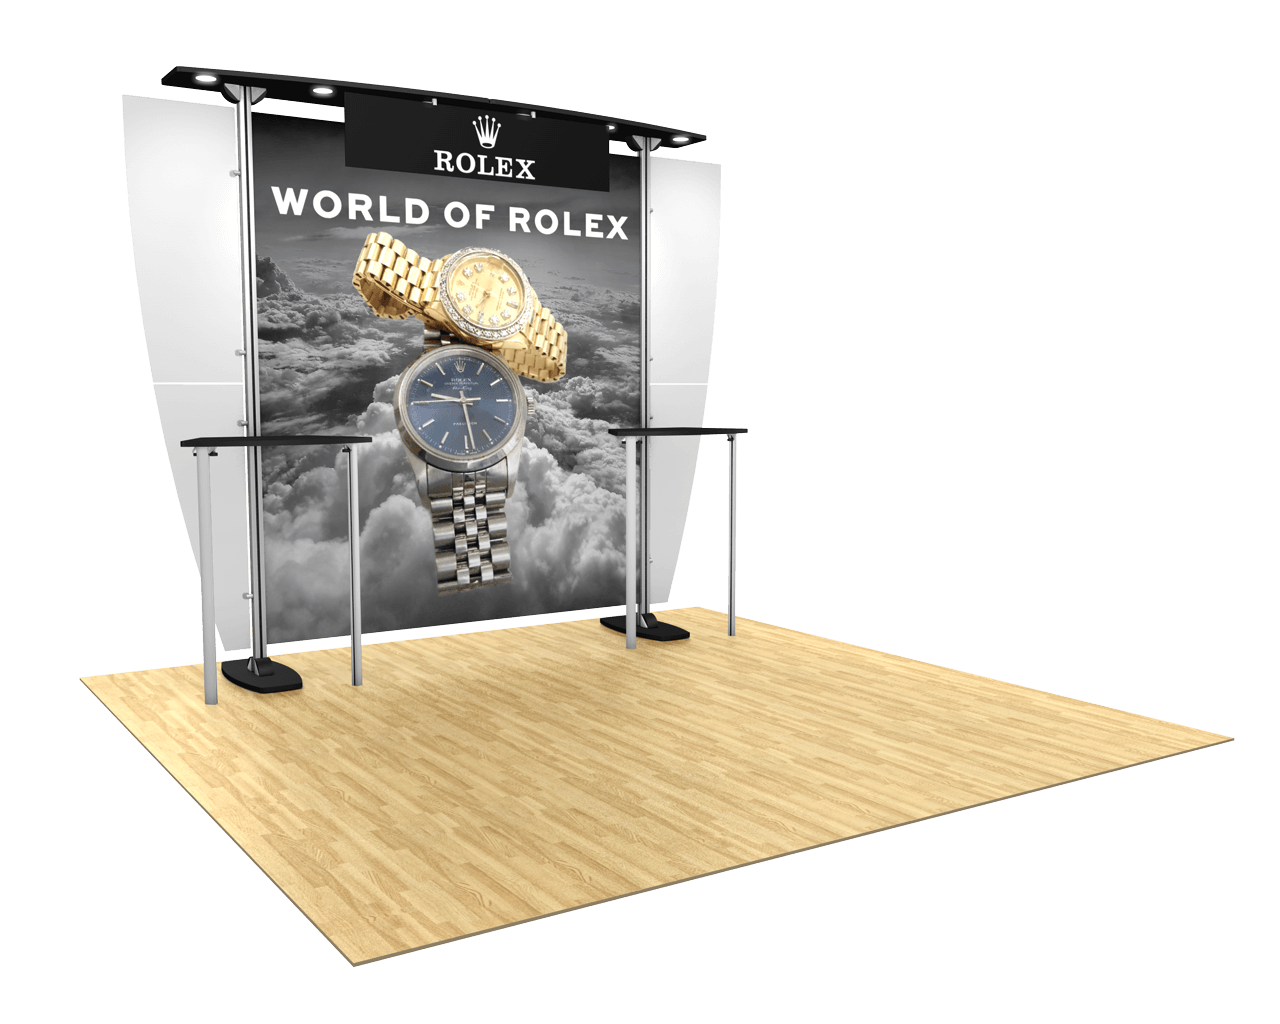 Exhibitline 10ft Trade Show Display - ex1 Model